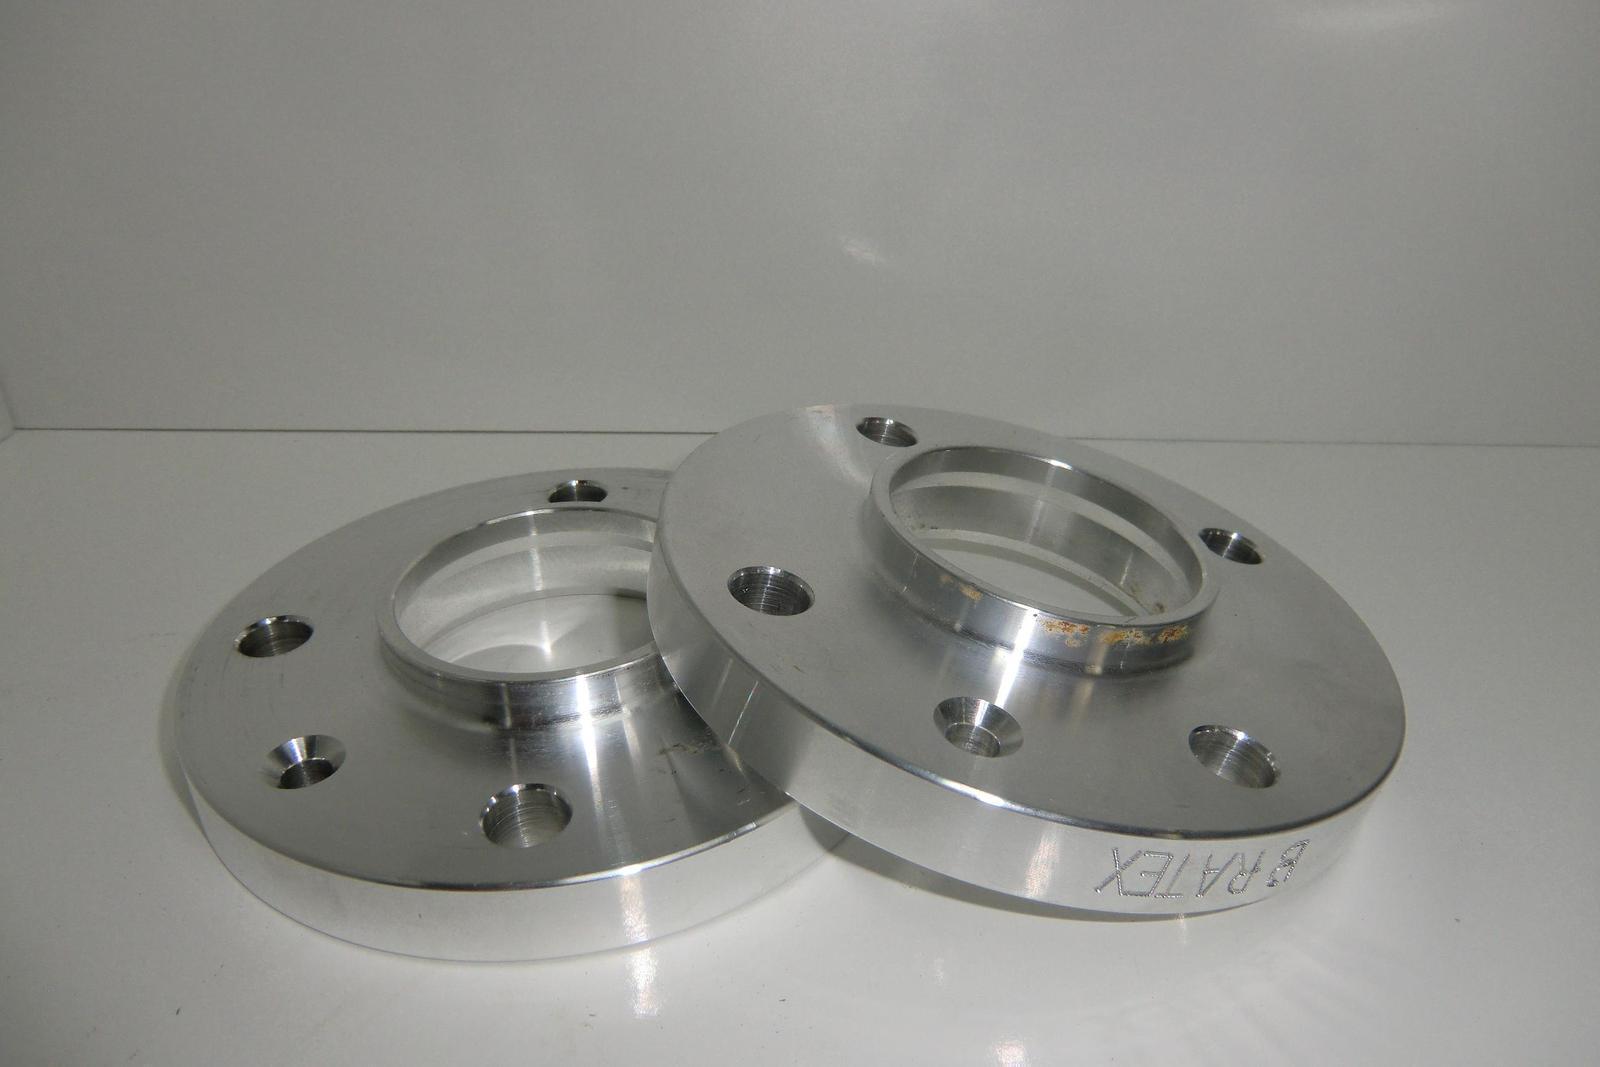 ELARGISSEURS DE VOIE ALUMINIUM 5 TROUS 16 mm